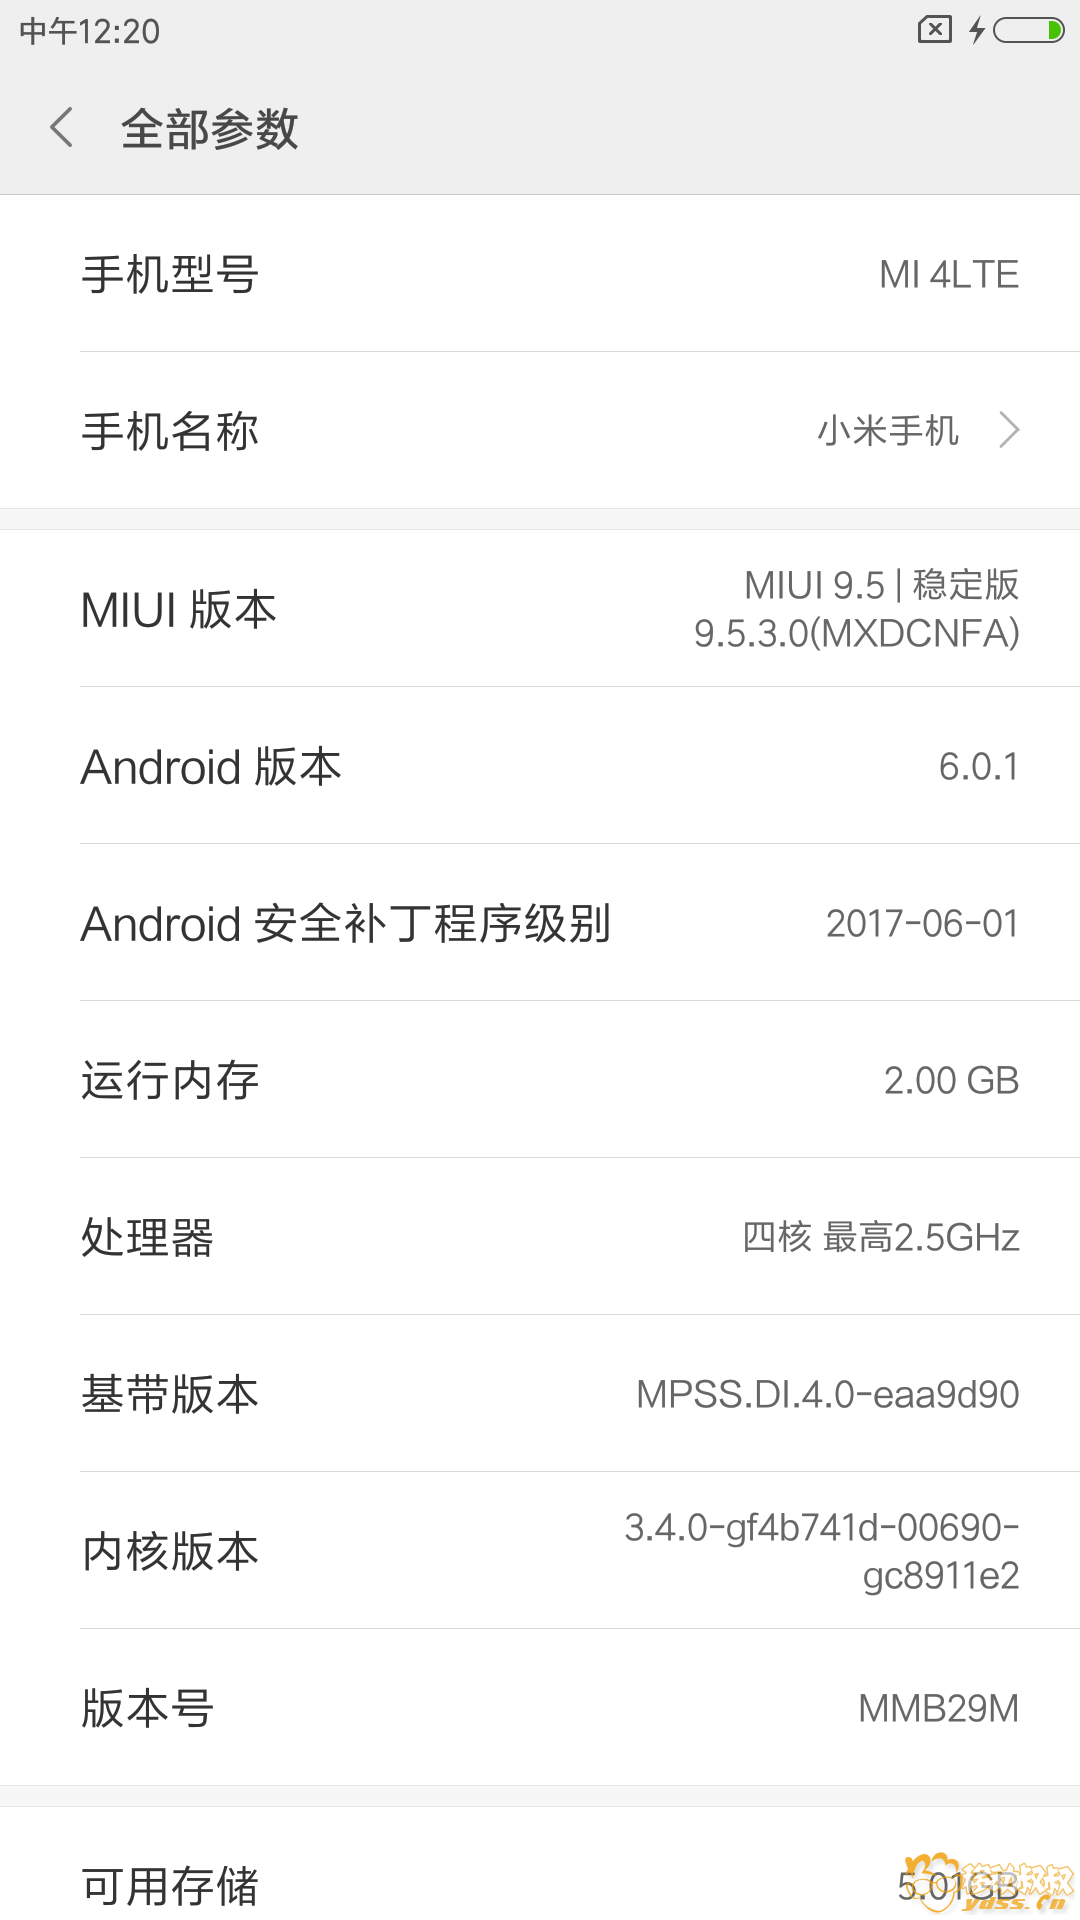 Screenshot_2018-05-21-12-20-55-928_com.android.settings.png